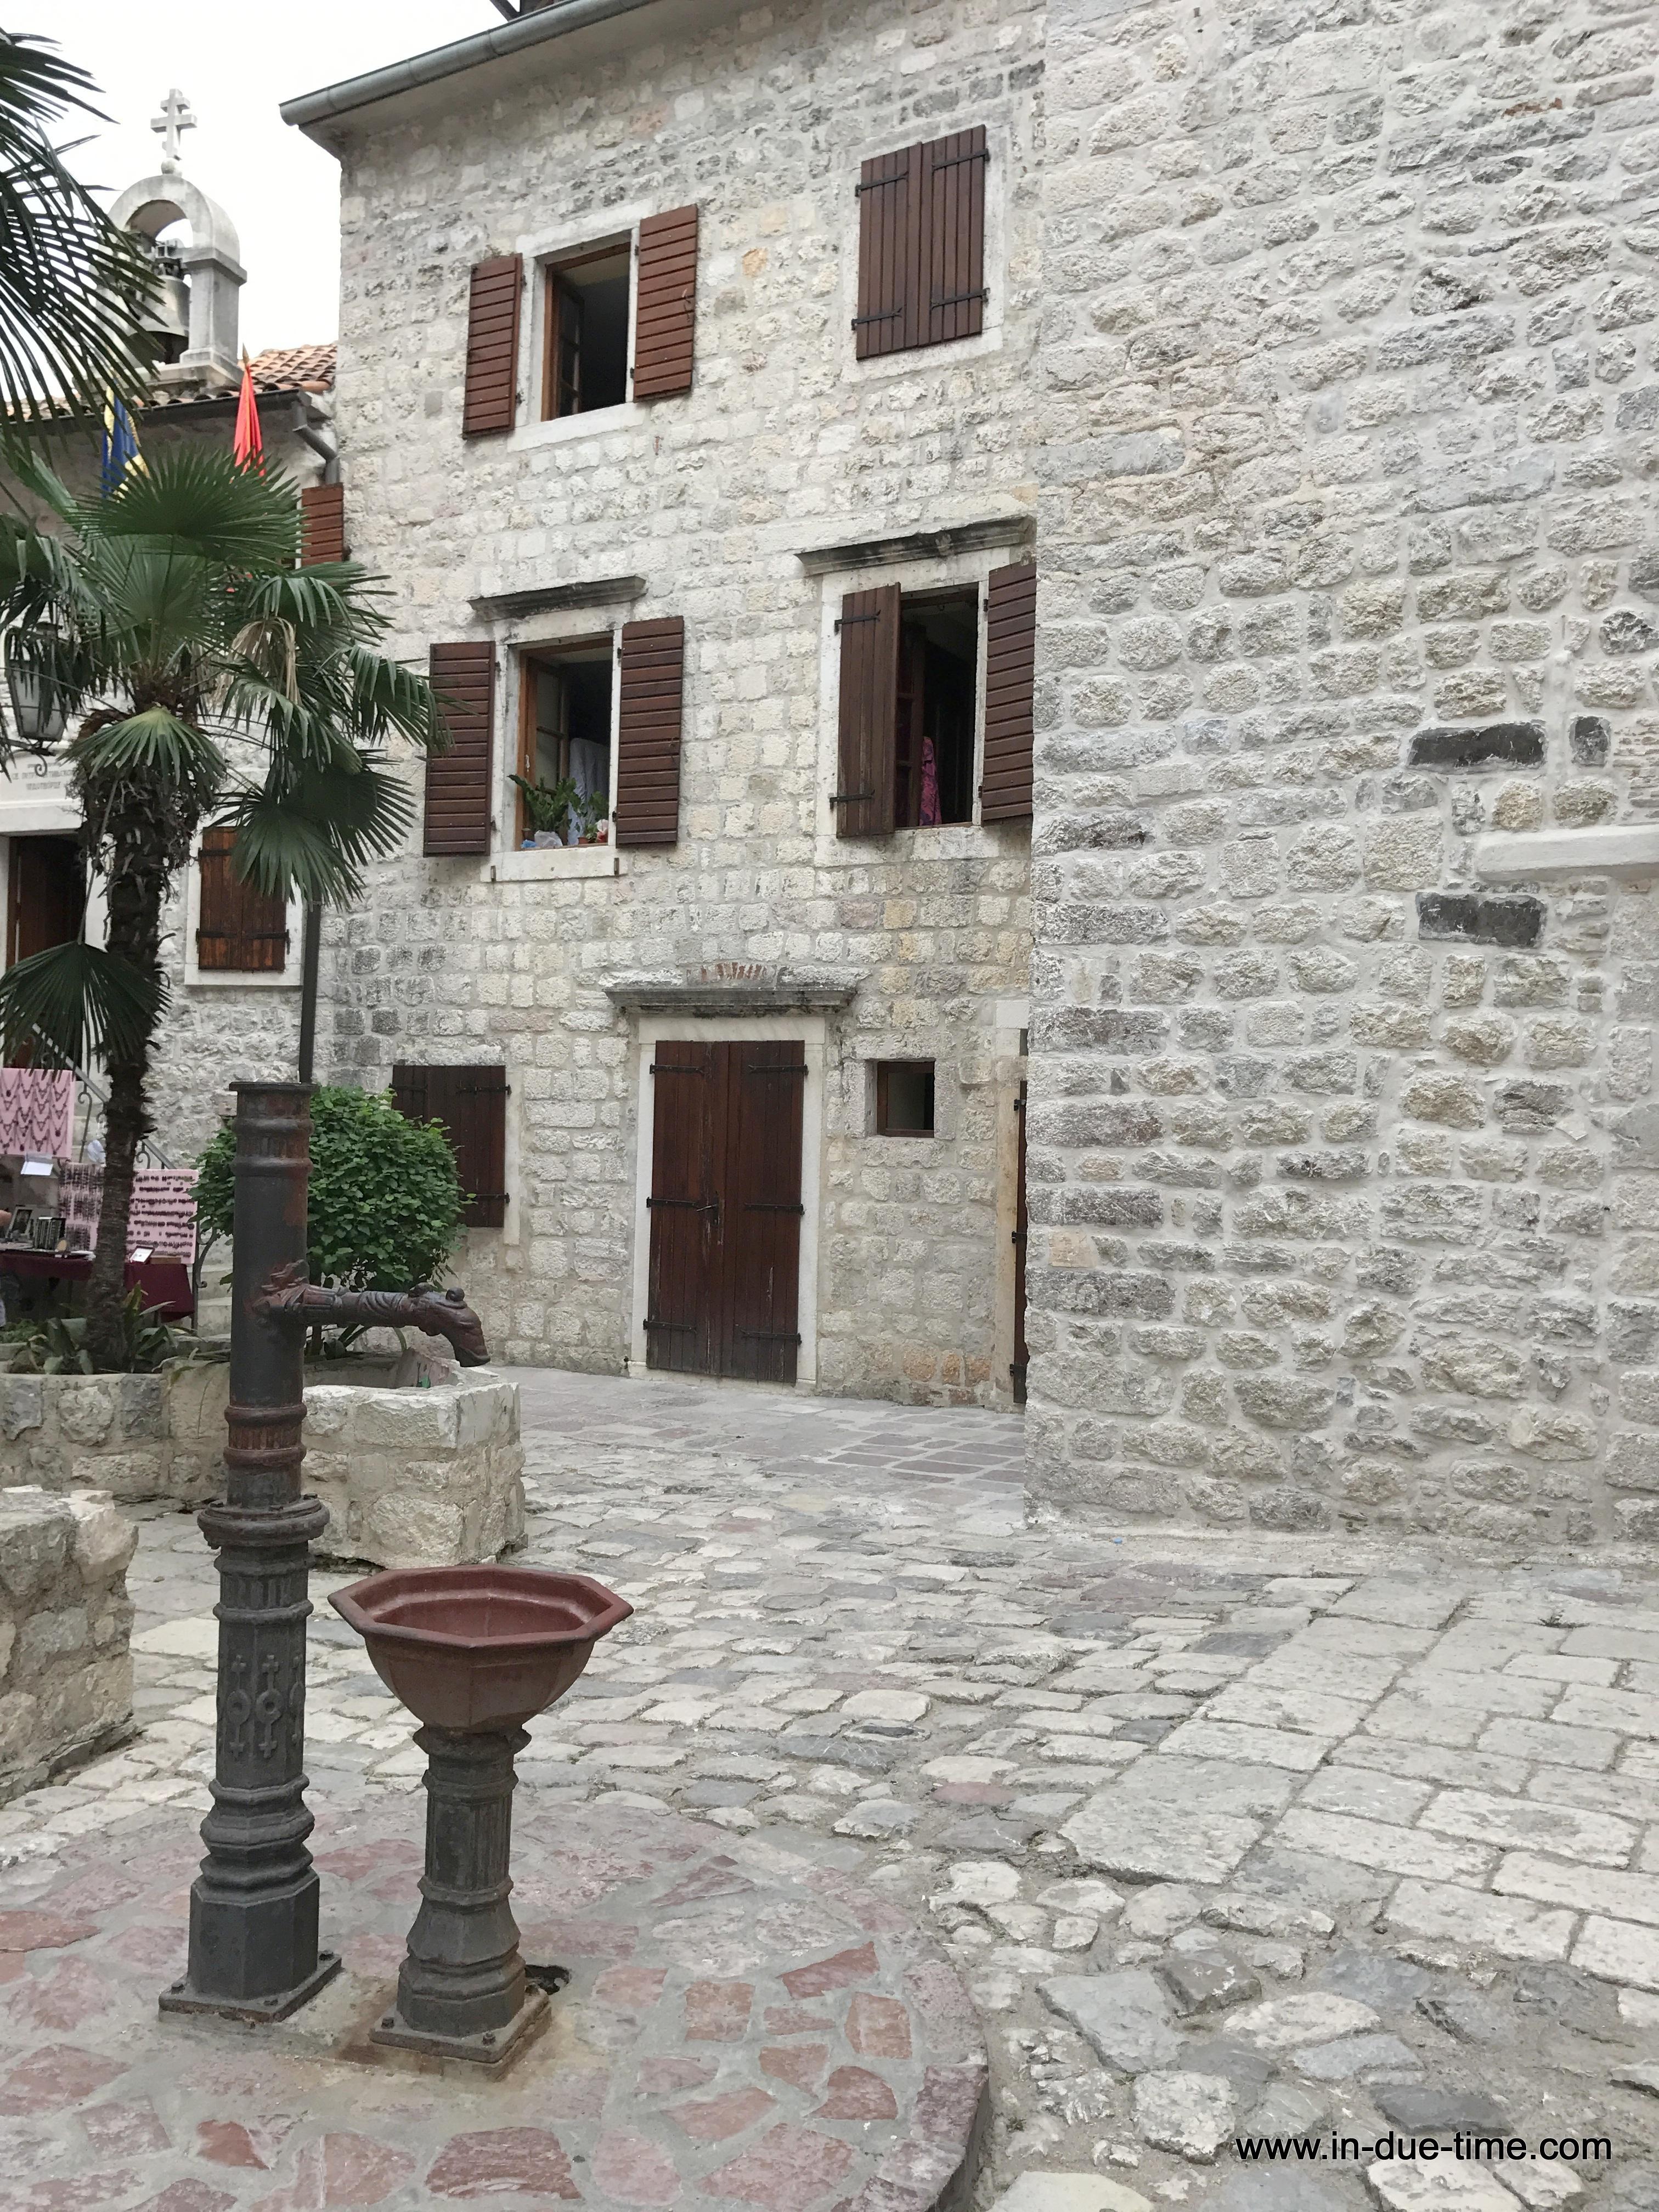 Europe - Montenegro